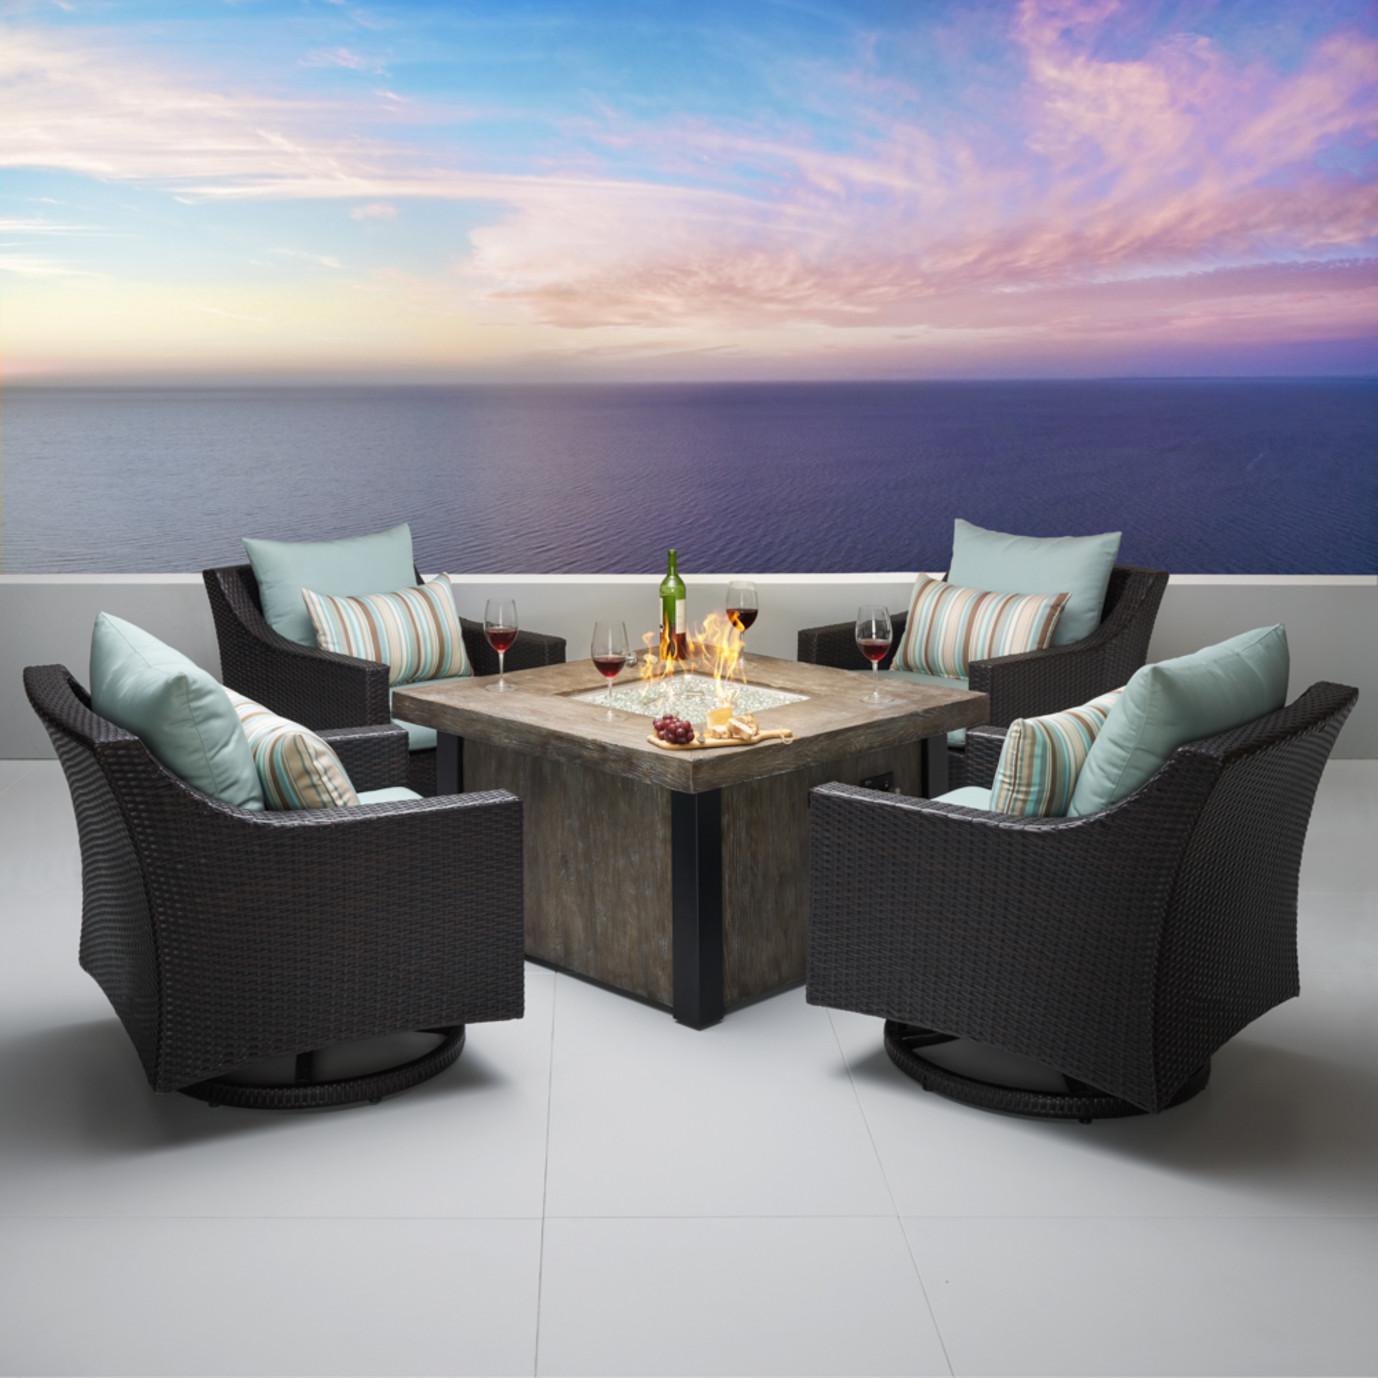 Deco™ 5pc Motion Fire Chat Set - Bliss Blue